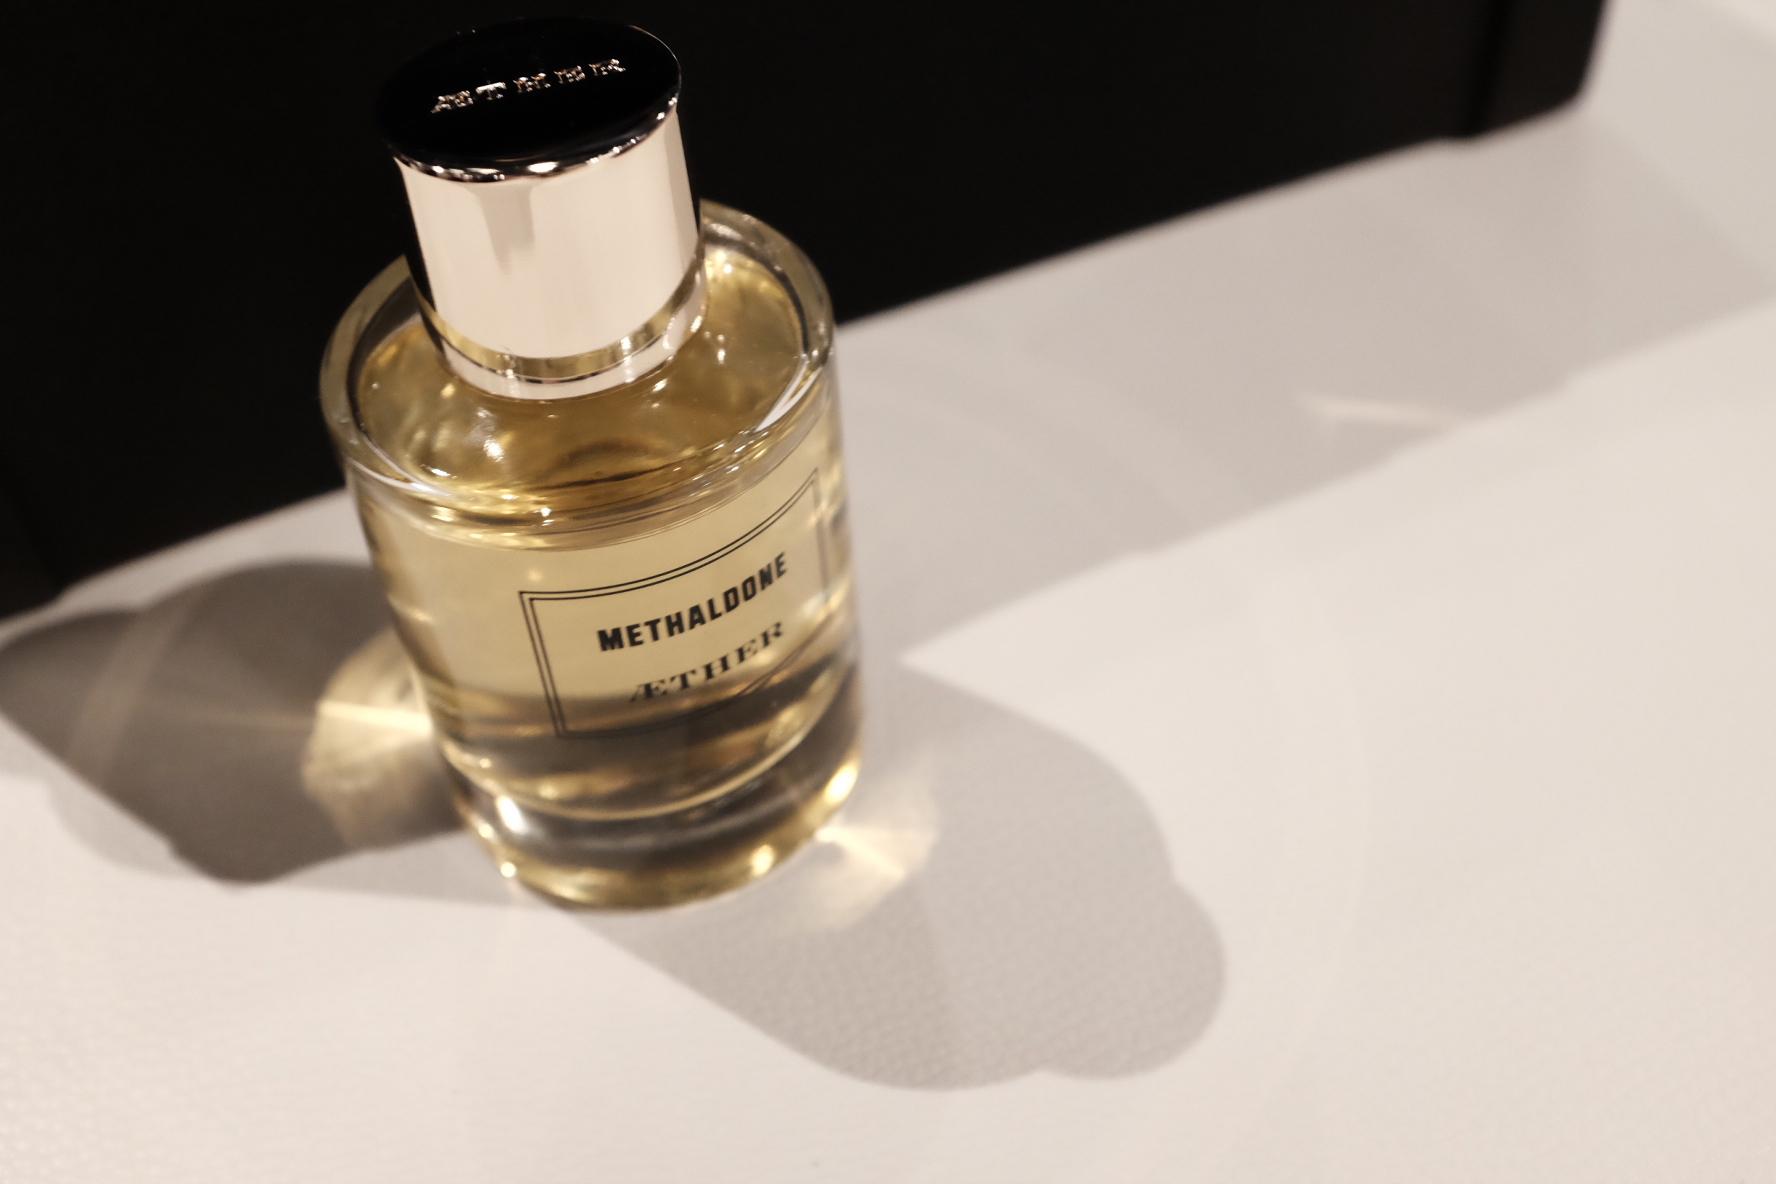 аромат Methaldon